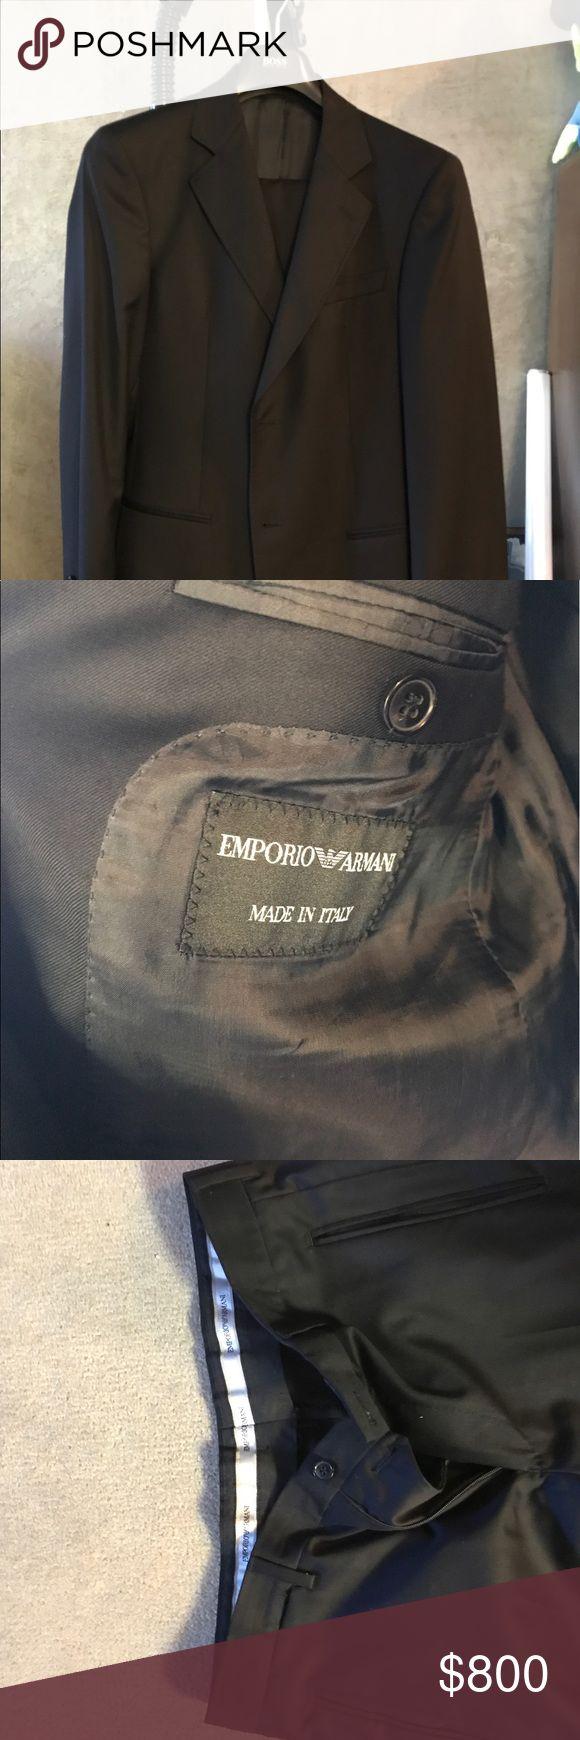 Emporio Armani Black Suit with Pants Emporio Armani Black suit size 48 with 30-31 matching pants Emporio Armani Suits & Blazers Suits